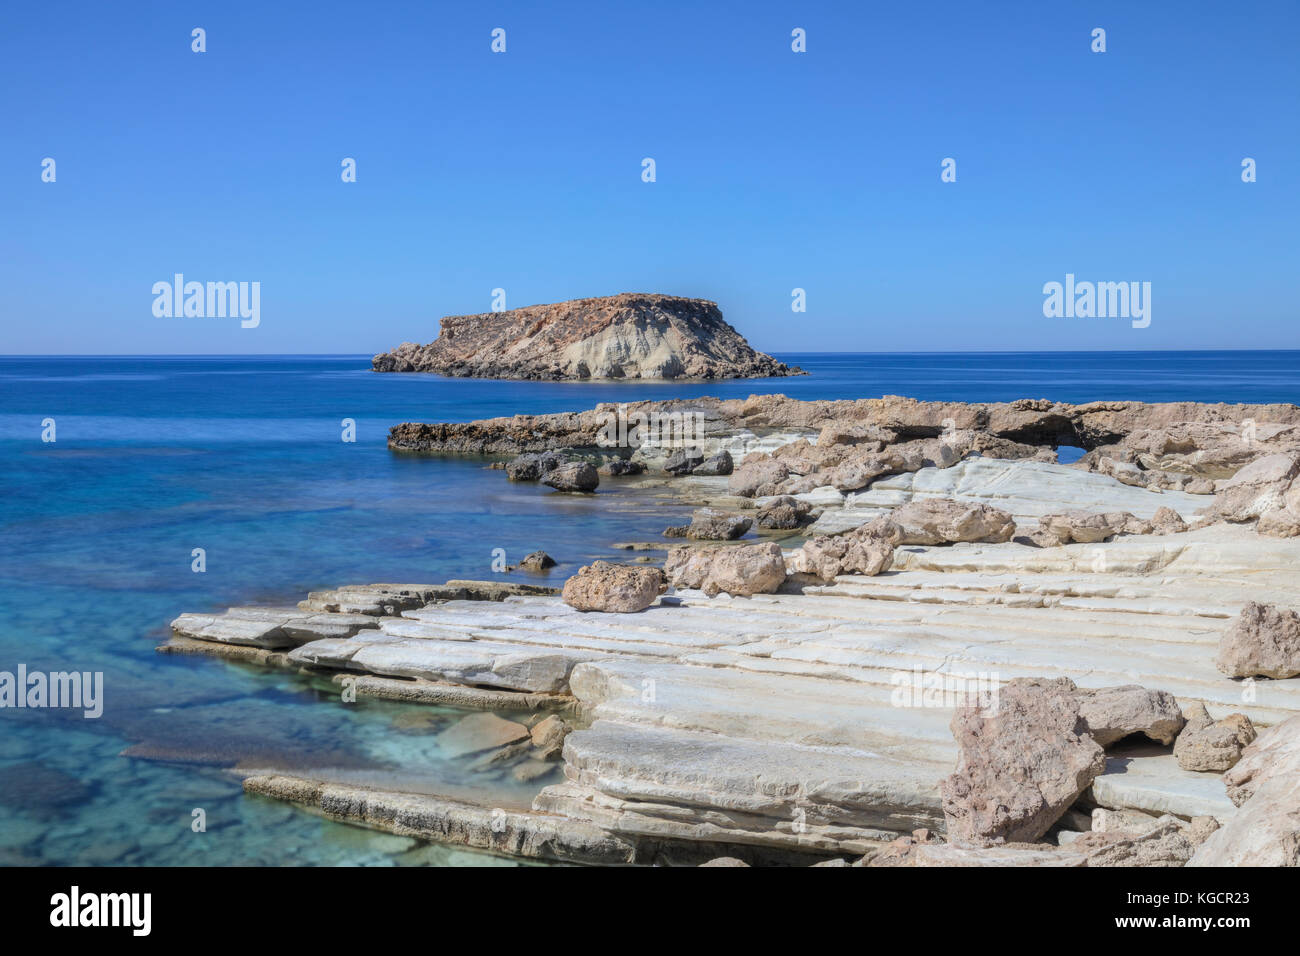 Agios Georgios Harbour, Pegeia, Paphos, Cyprus - Stock Image